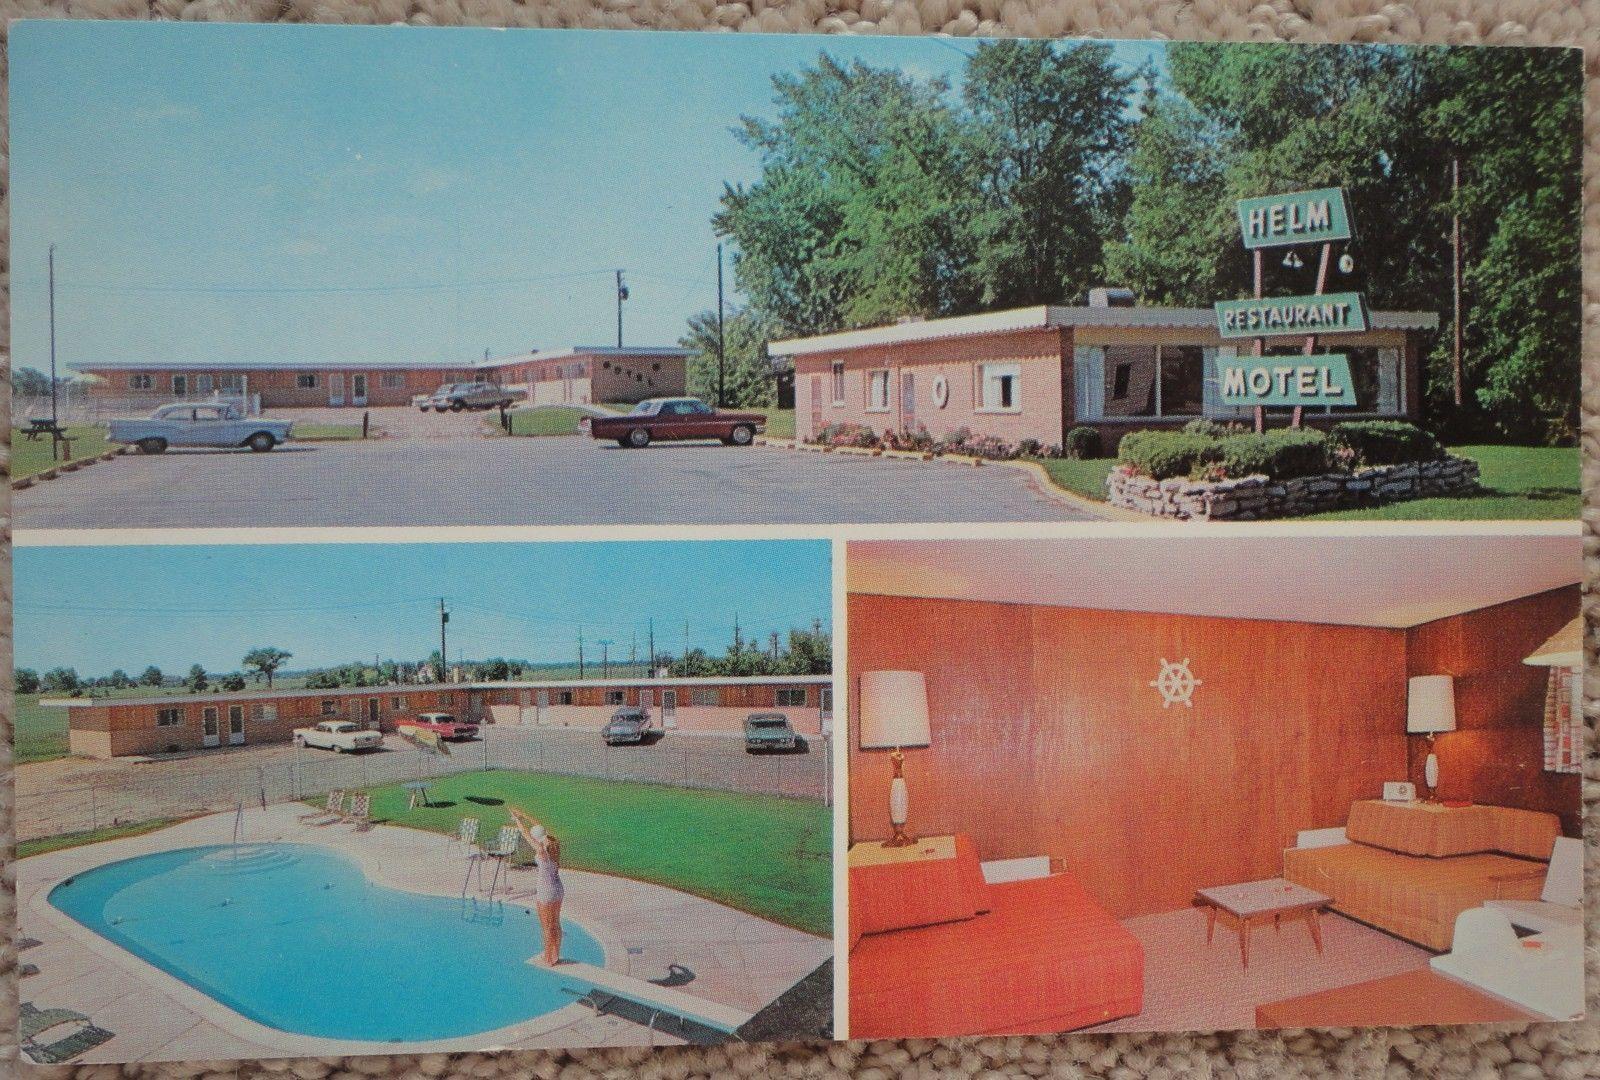 Helm Restaurant & Motel, Harbor Beach, MI 1950s Harbor